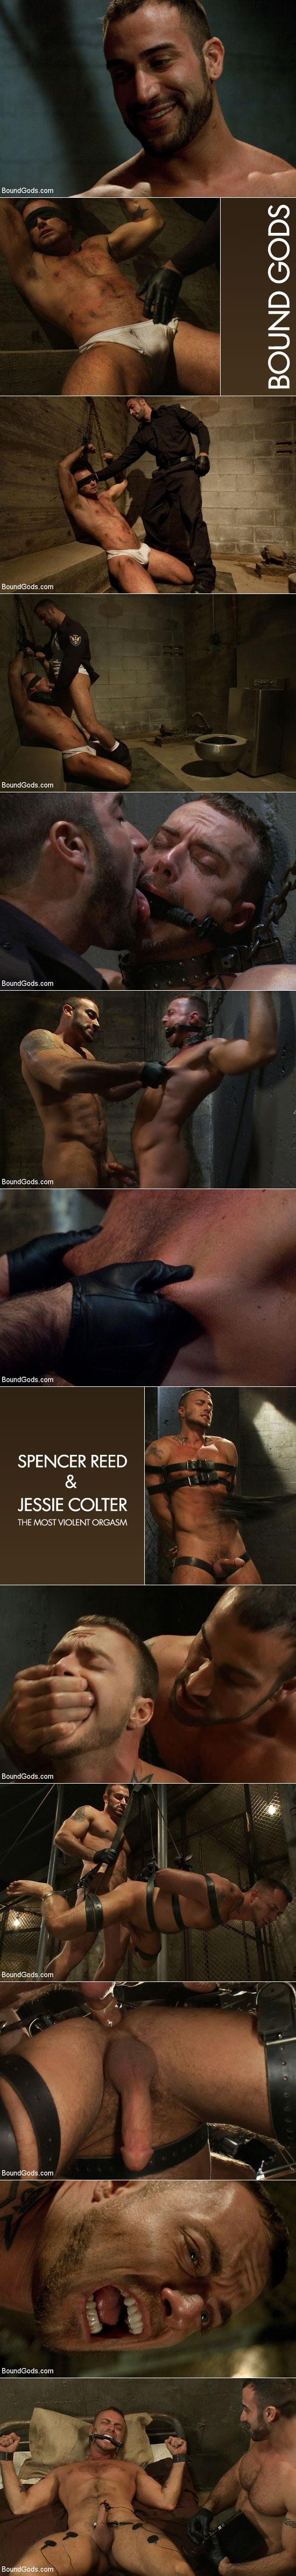 The most violent orgasm